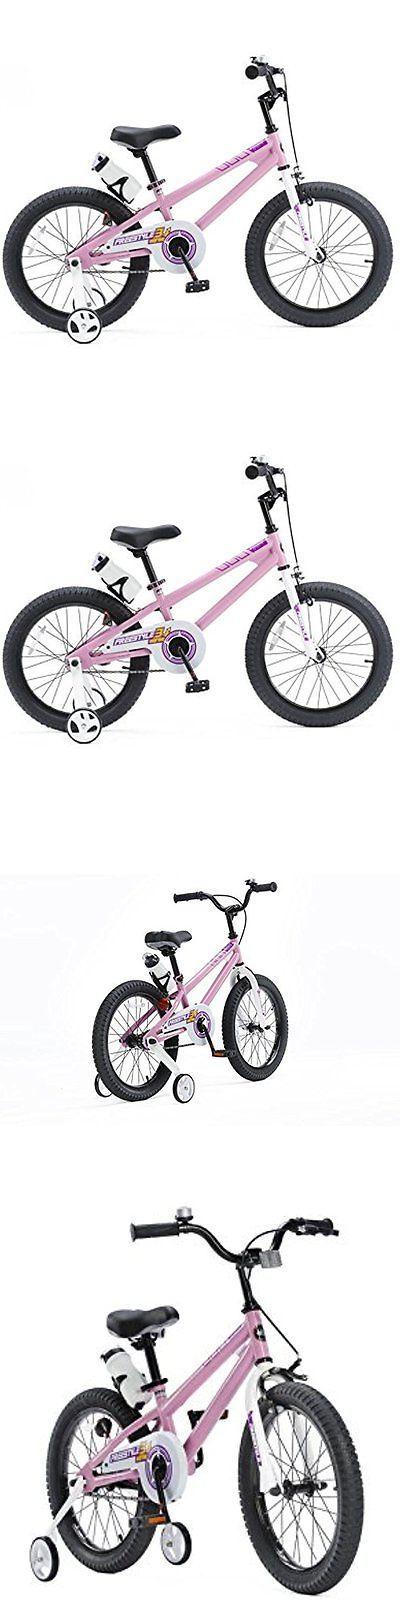 Training Wheels 177839: Kids Bikes Royalbaby Bmx Freestyle Kids Bike, Boys Bikes And Girls Bikes With 12 BUY IT NOW ONLY: $119.49